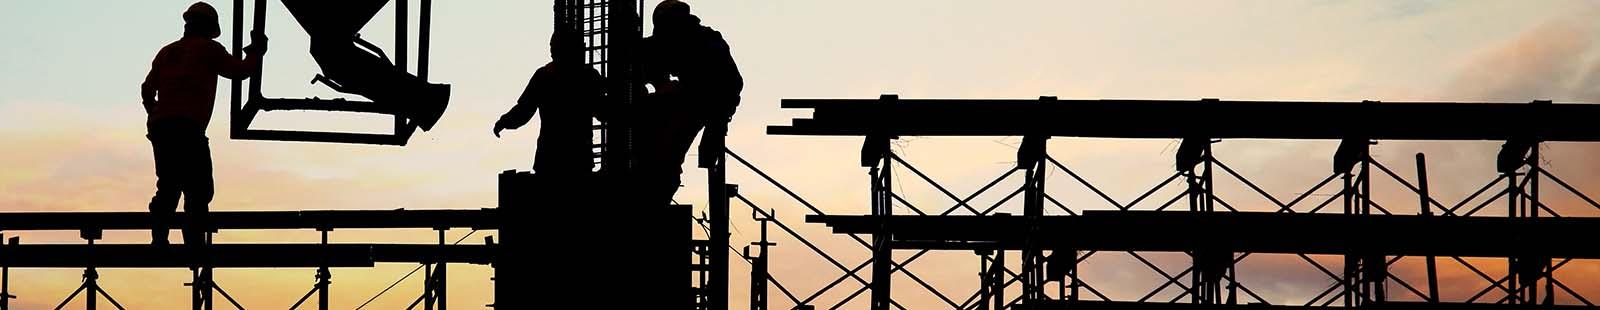 construction-Hero.jpg